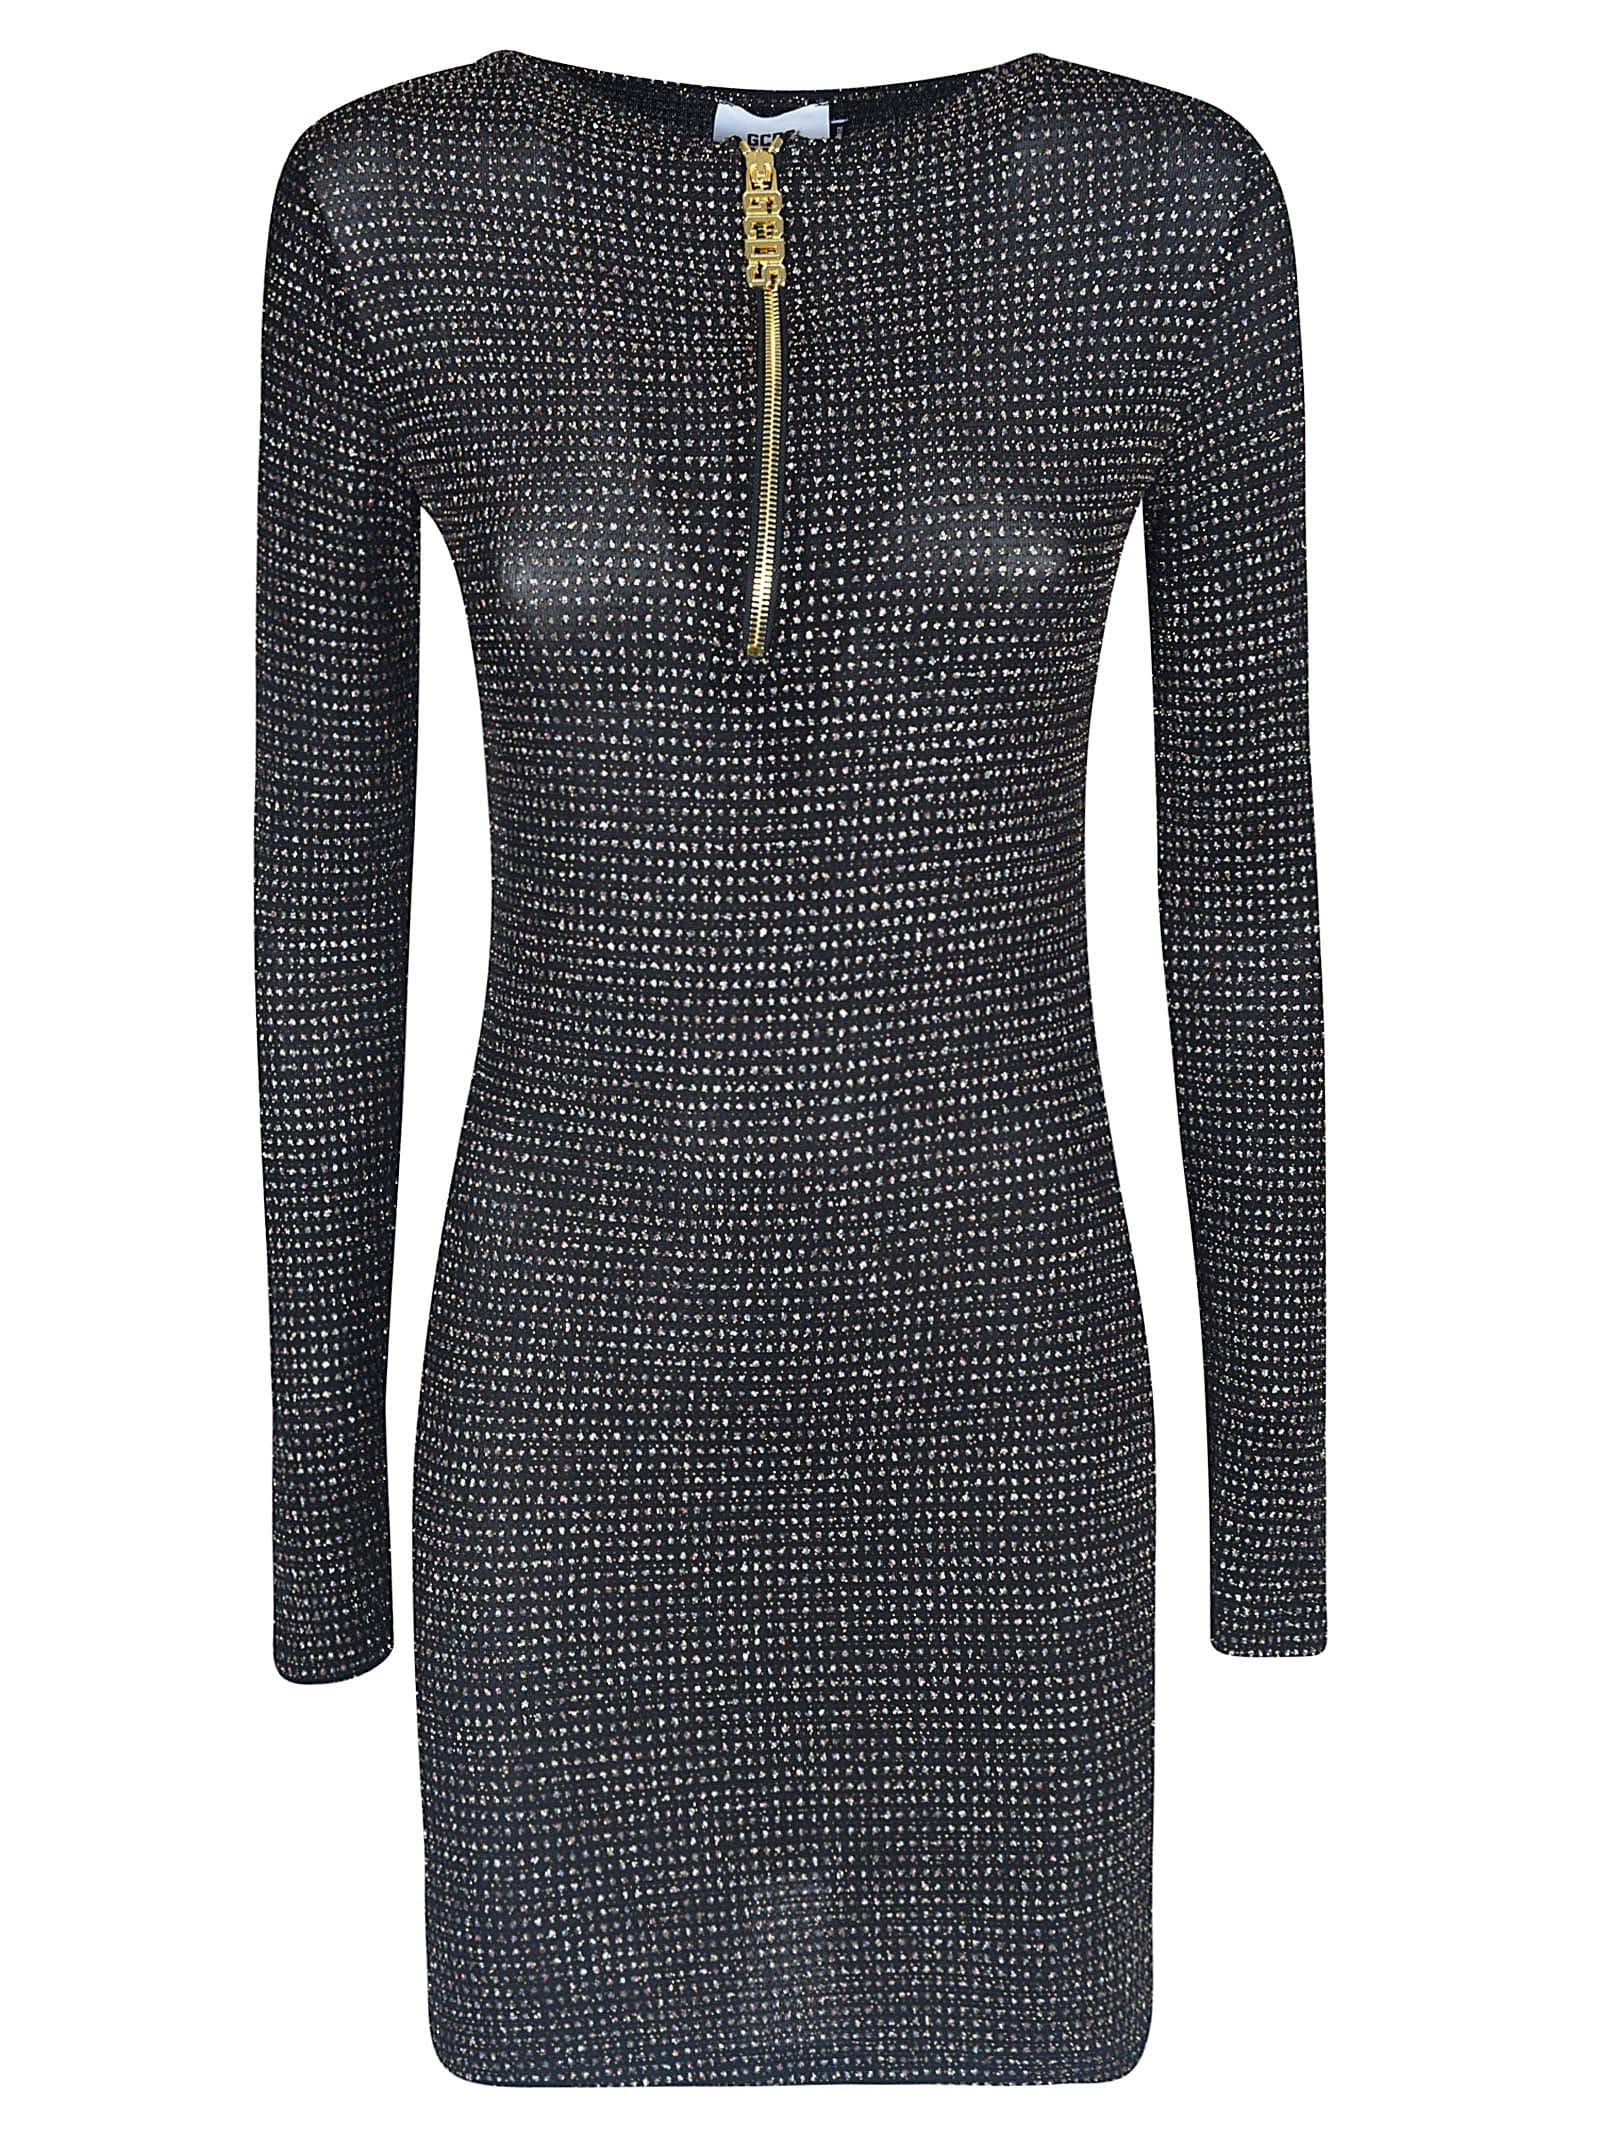 GCDS Zipped Fitted Dress